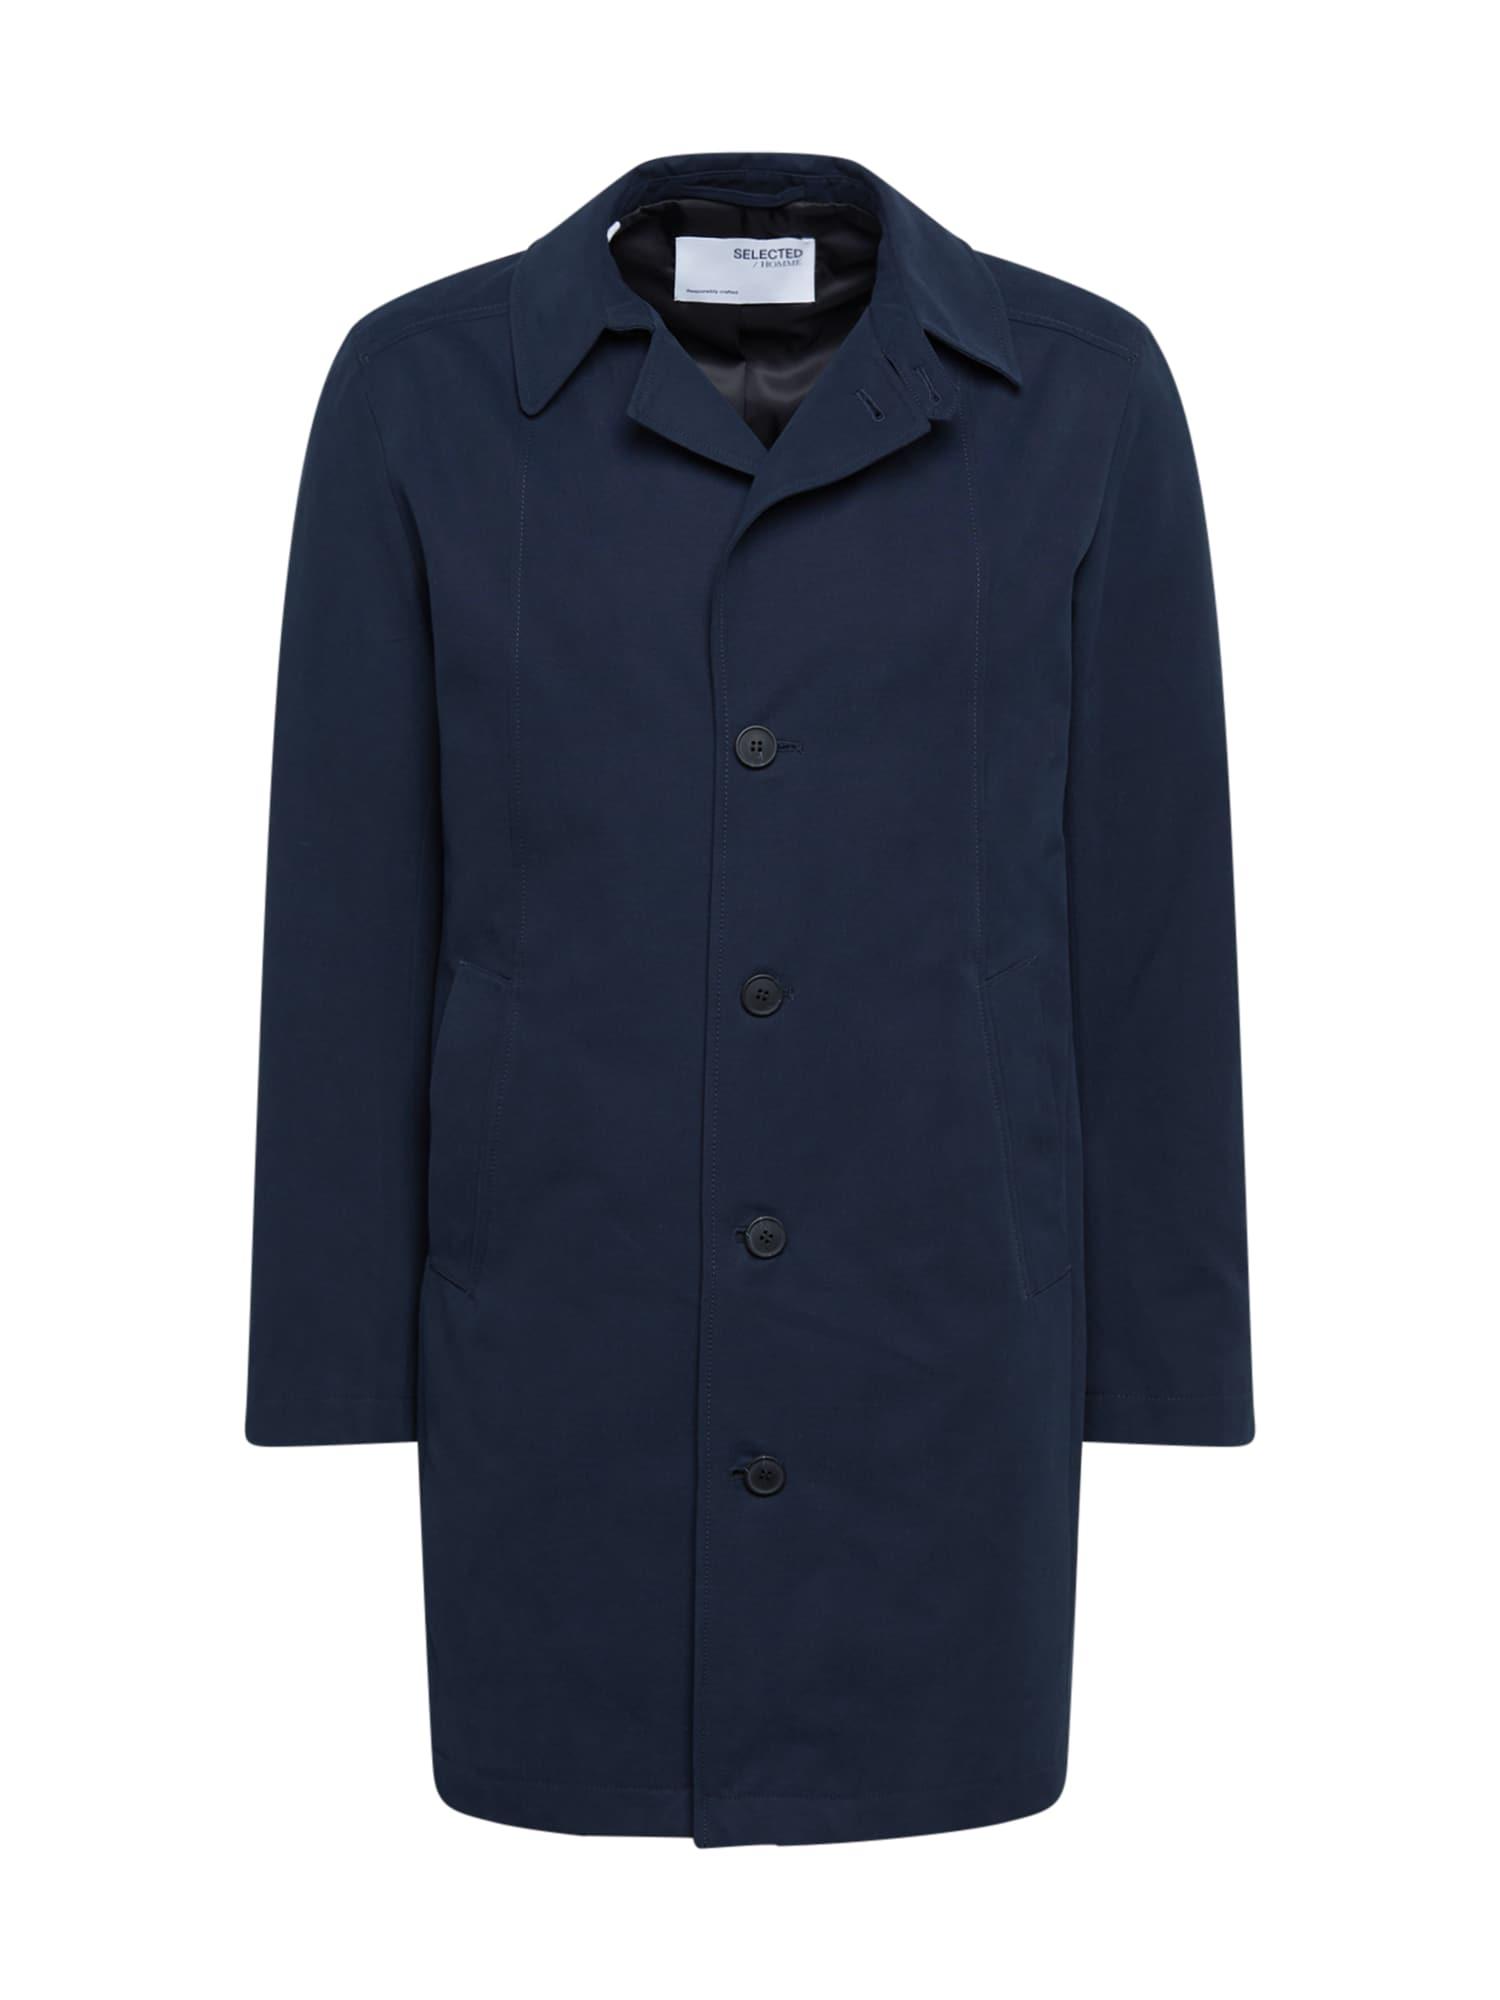 SELECTED HOMME Demisezoninis paltas tamsiai mėlyna jūros spalva